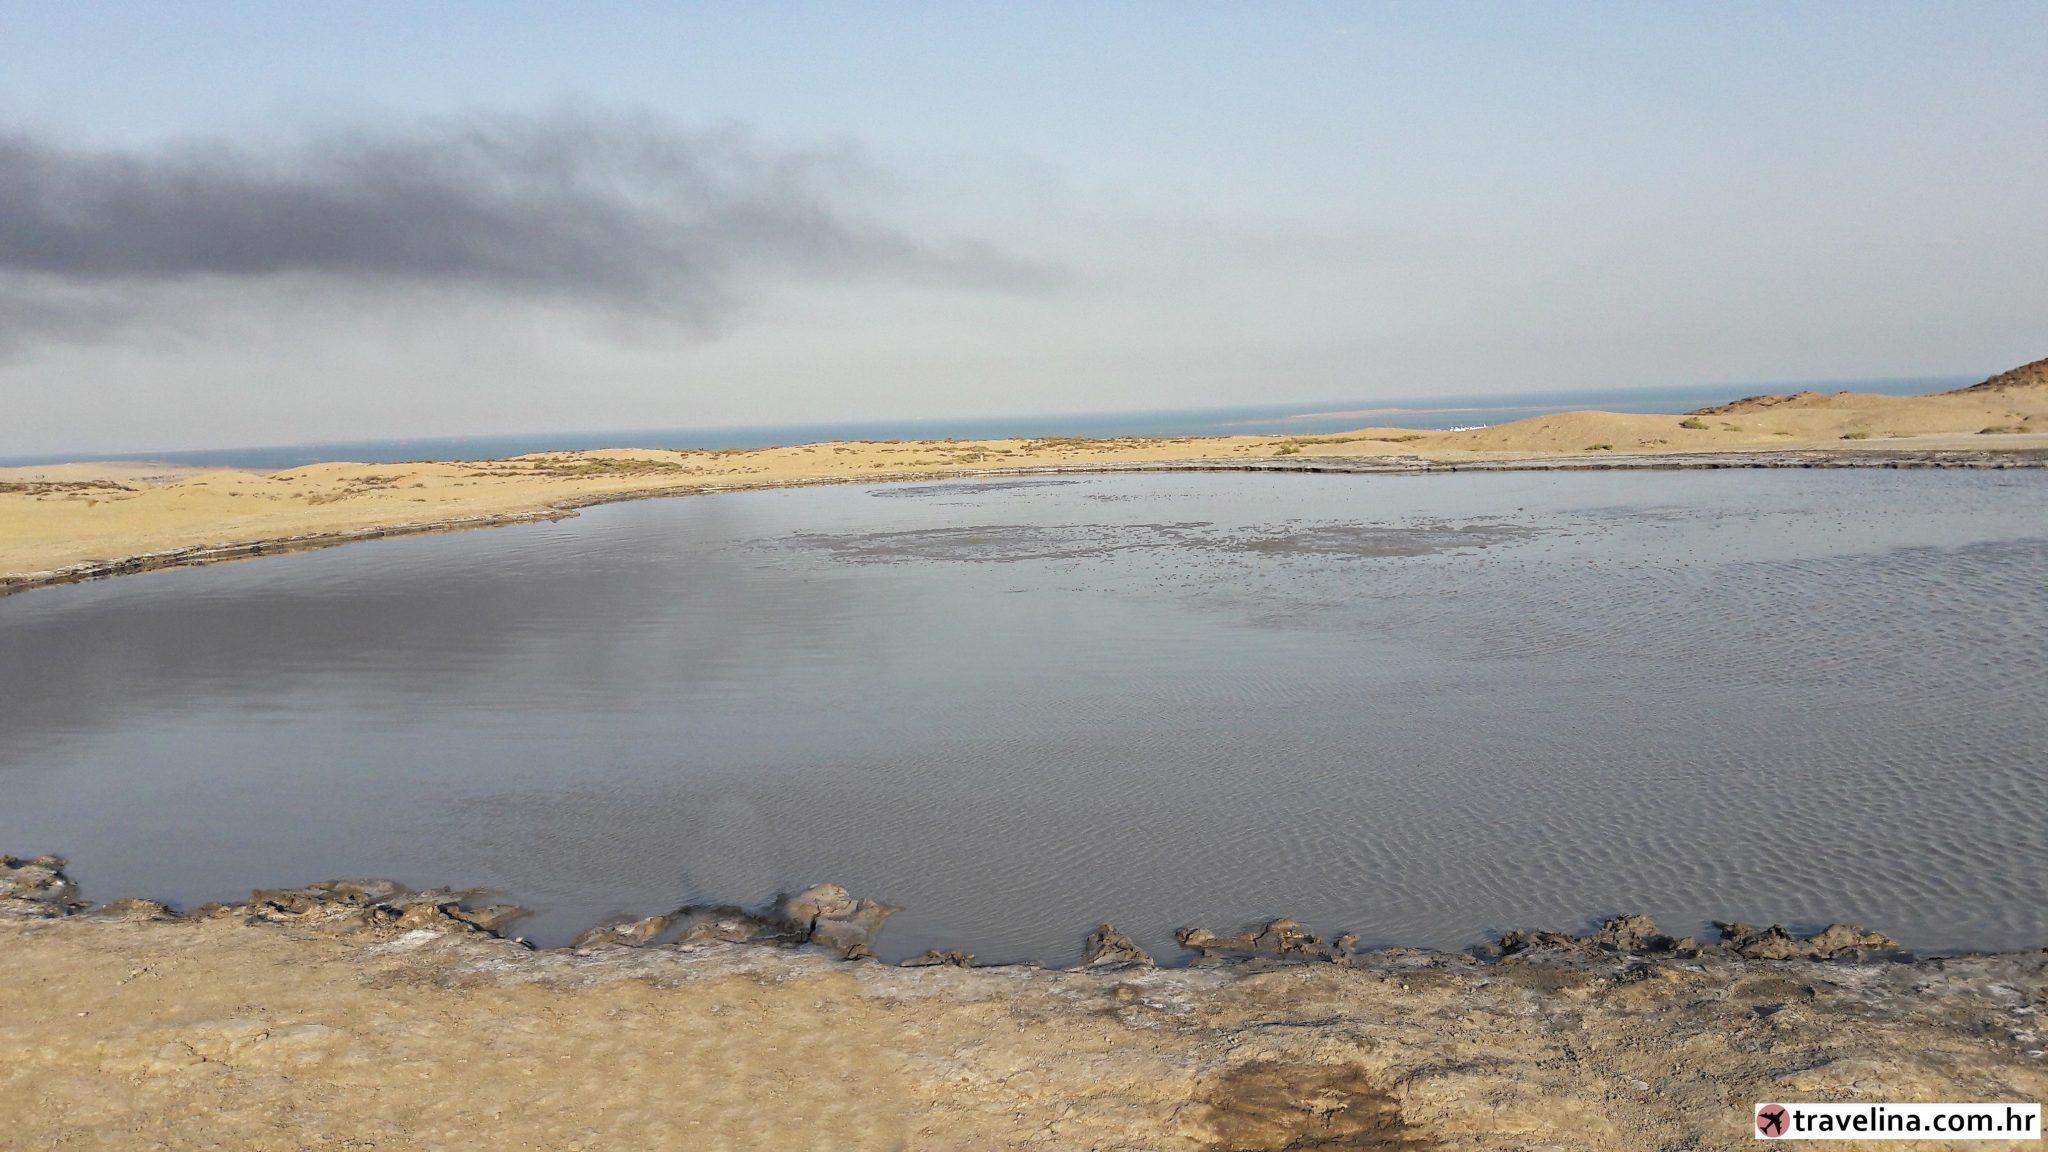 blatnih vulkana Azerbajdžana